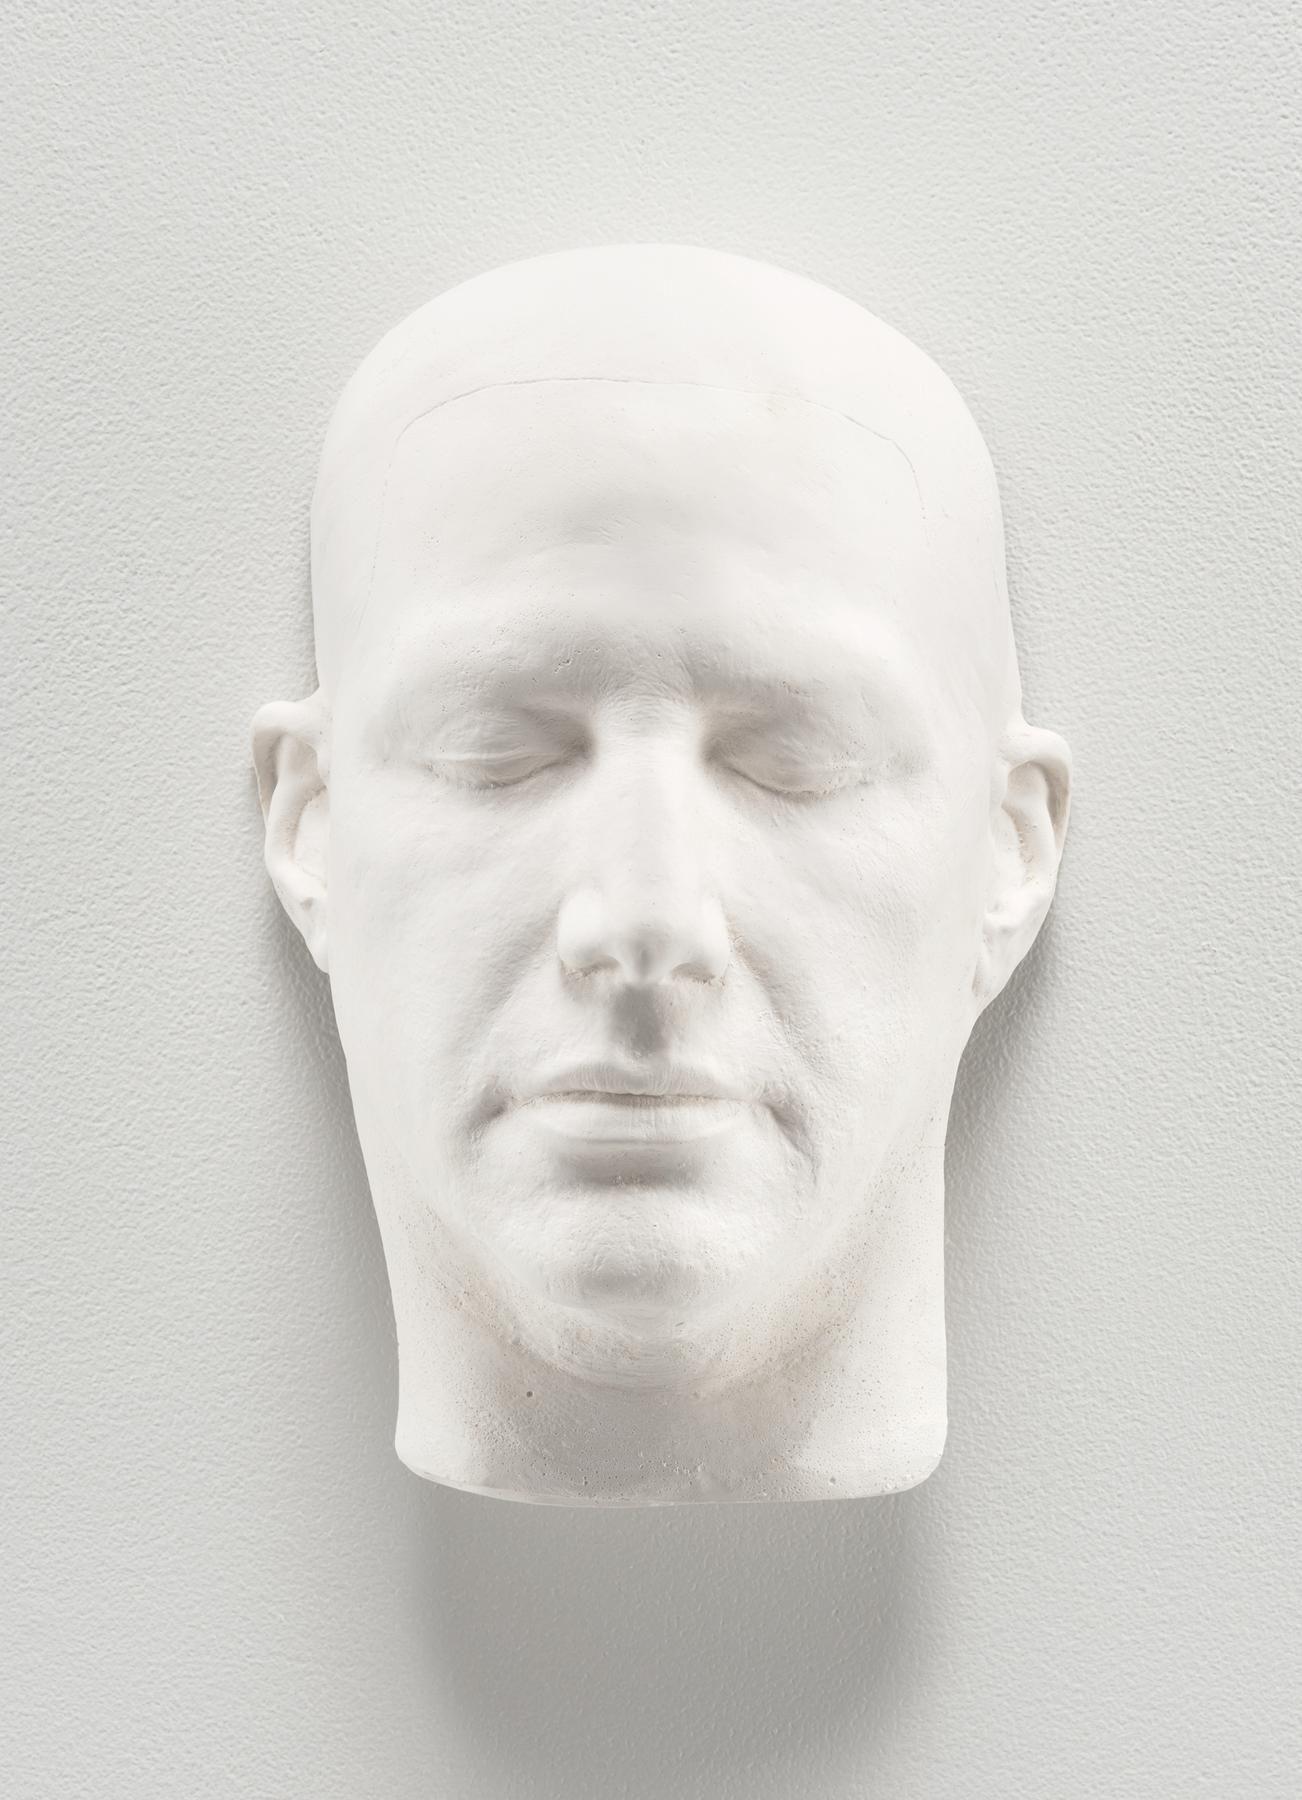 Edmier imagines (Keanu Reeves, Actor)